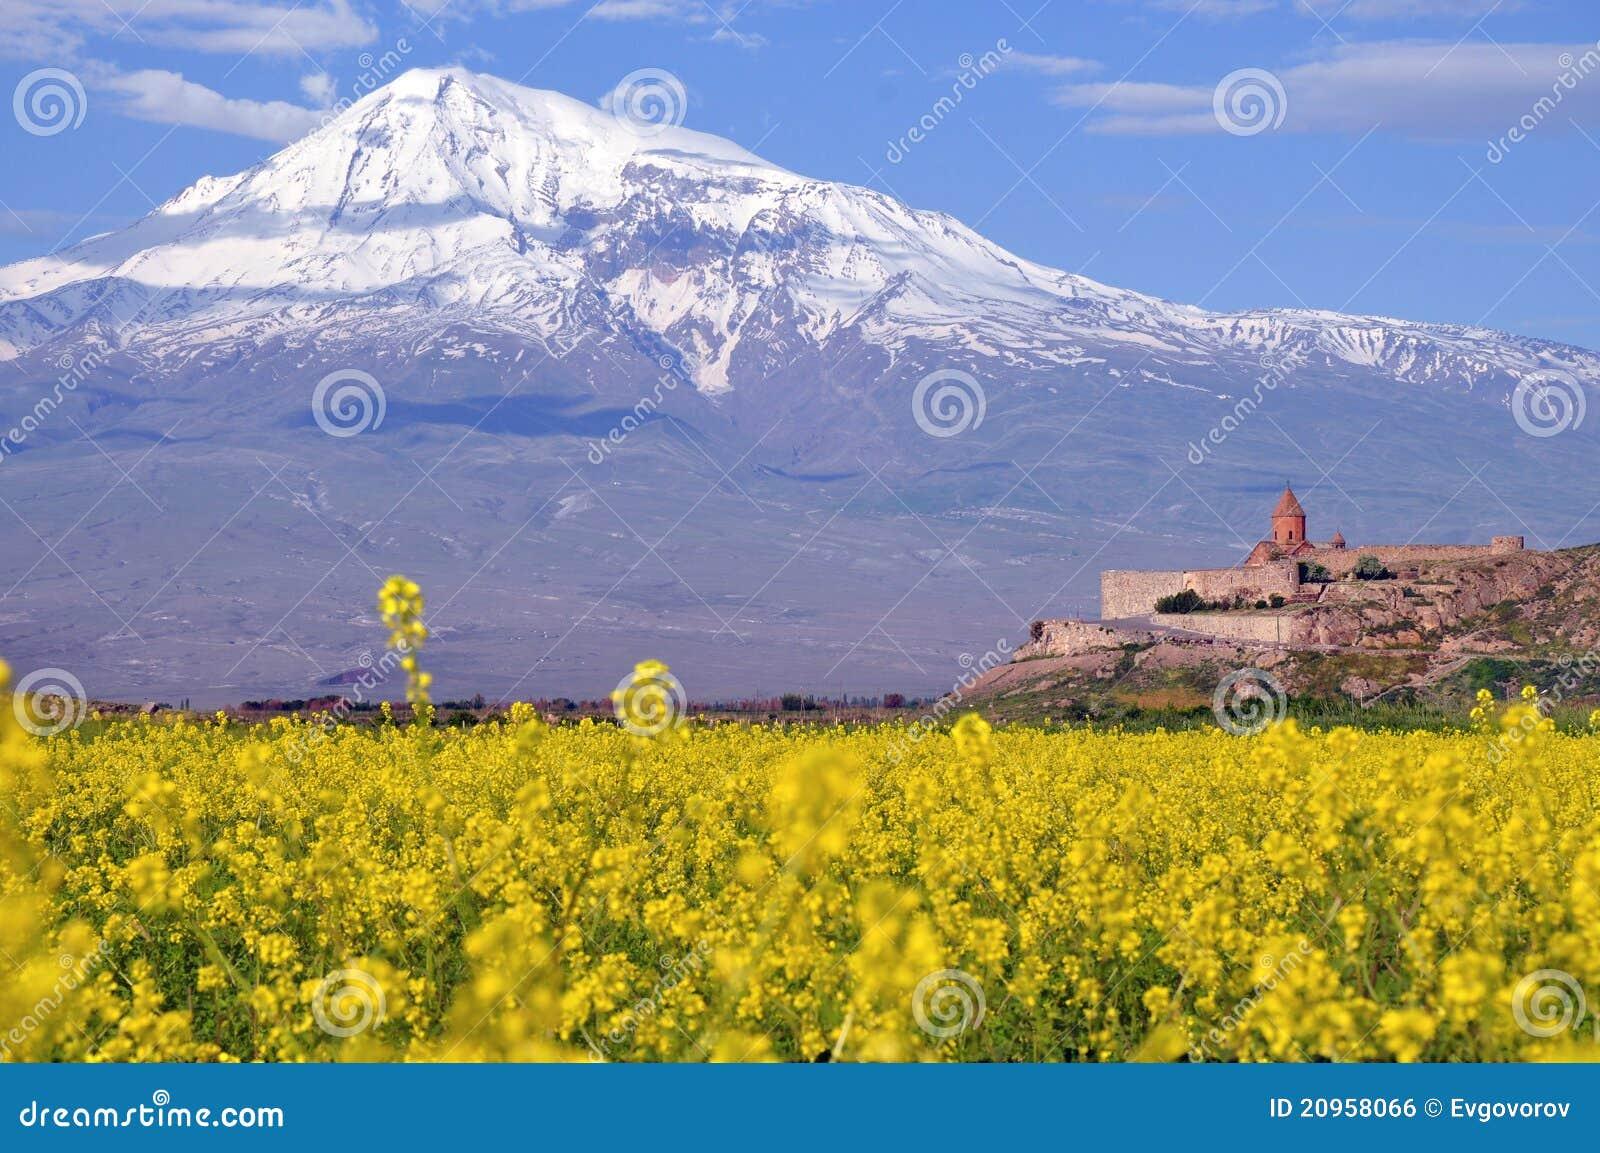 Ararat in armenia royalty free stock image image 20958066 for Ararat armenian cuisine